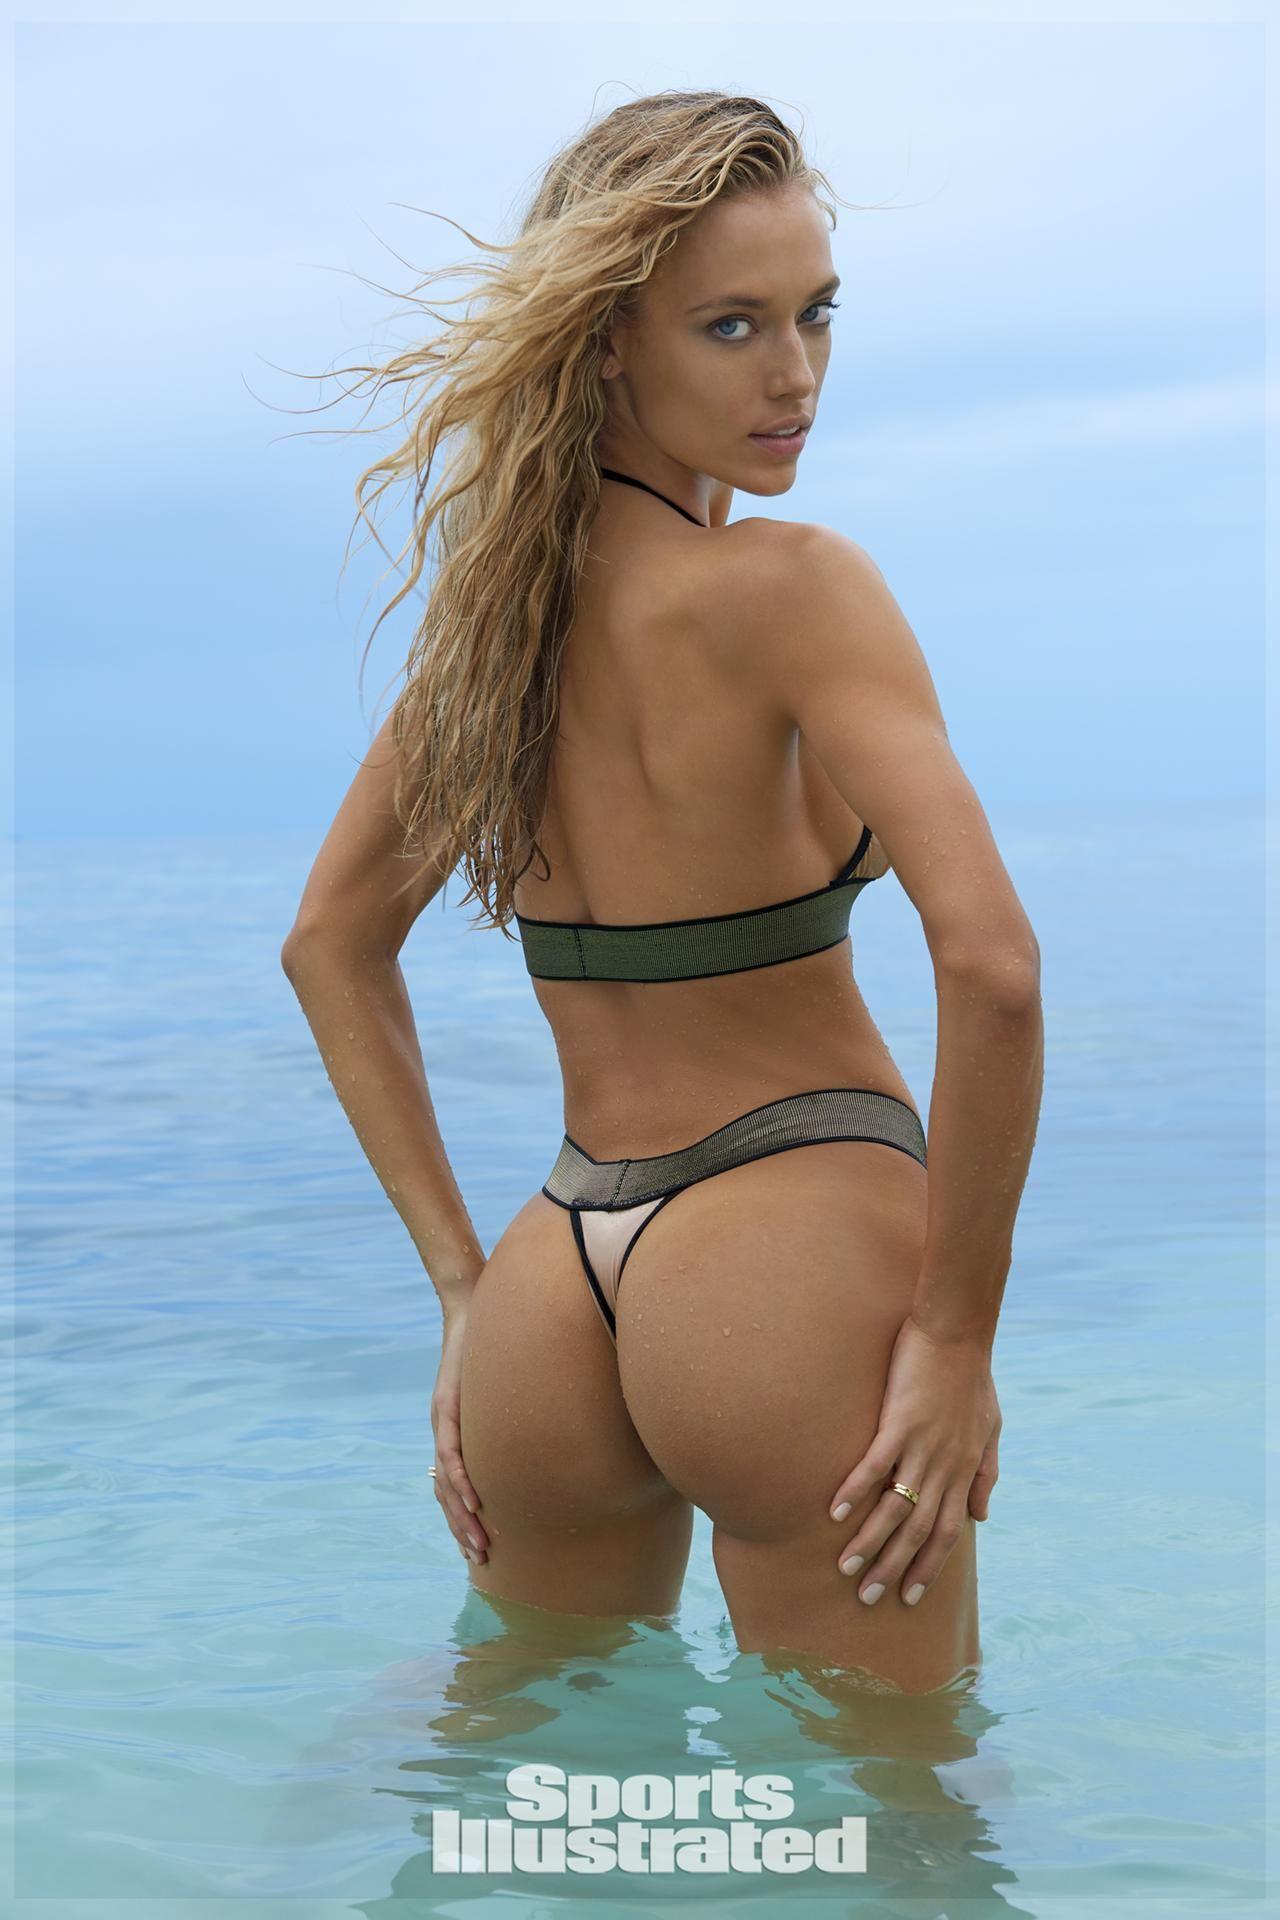 fa5fb61d158ea Hannah Ferguson was photographed by Yu Tsai in Fiji. Swimsuit by Dolcessa.  Hannah Ferguson